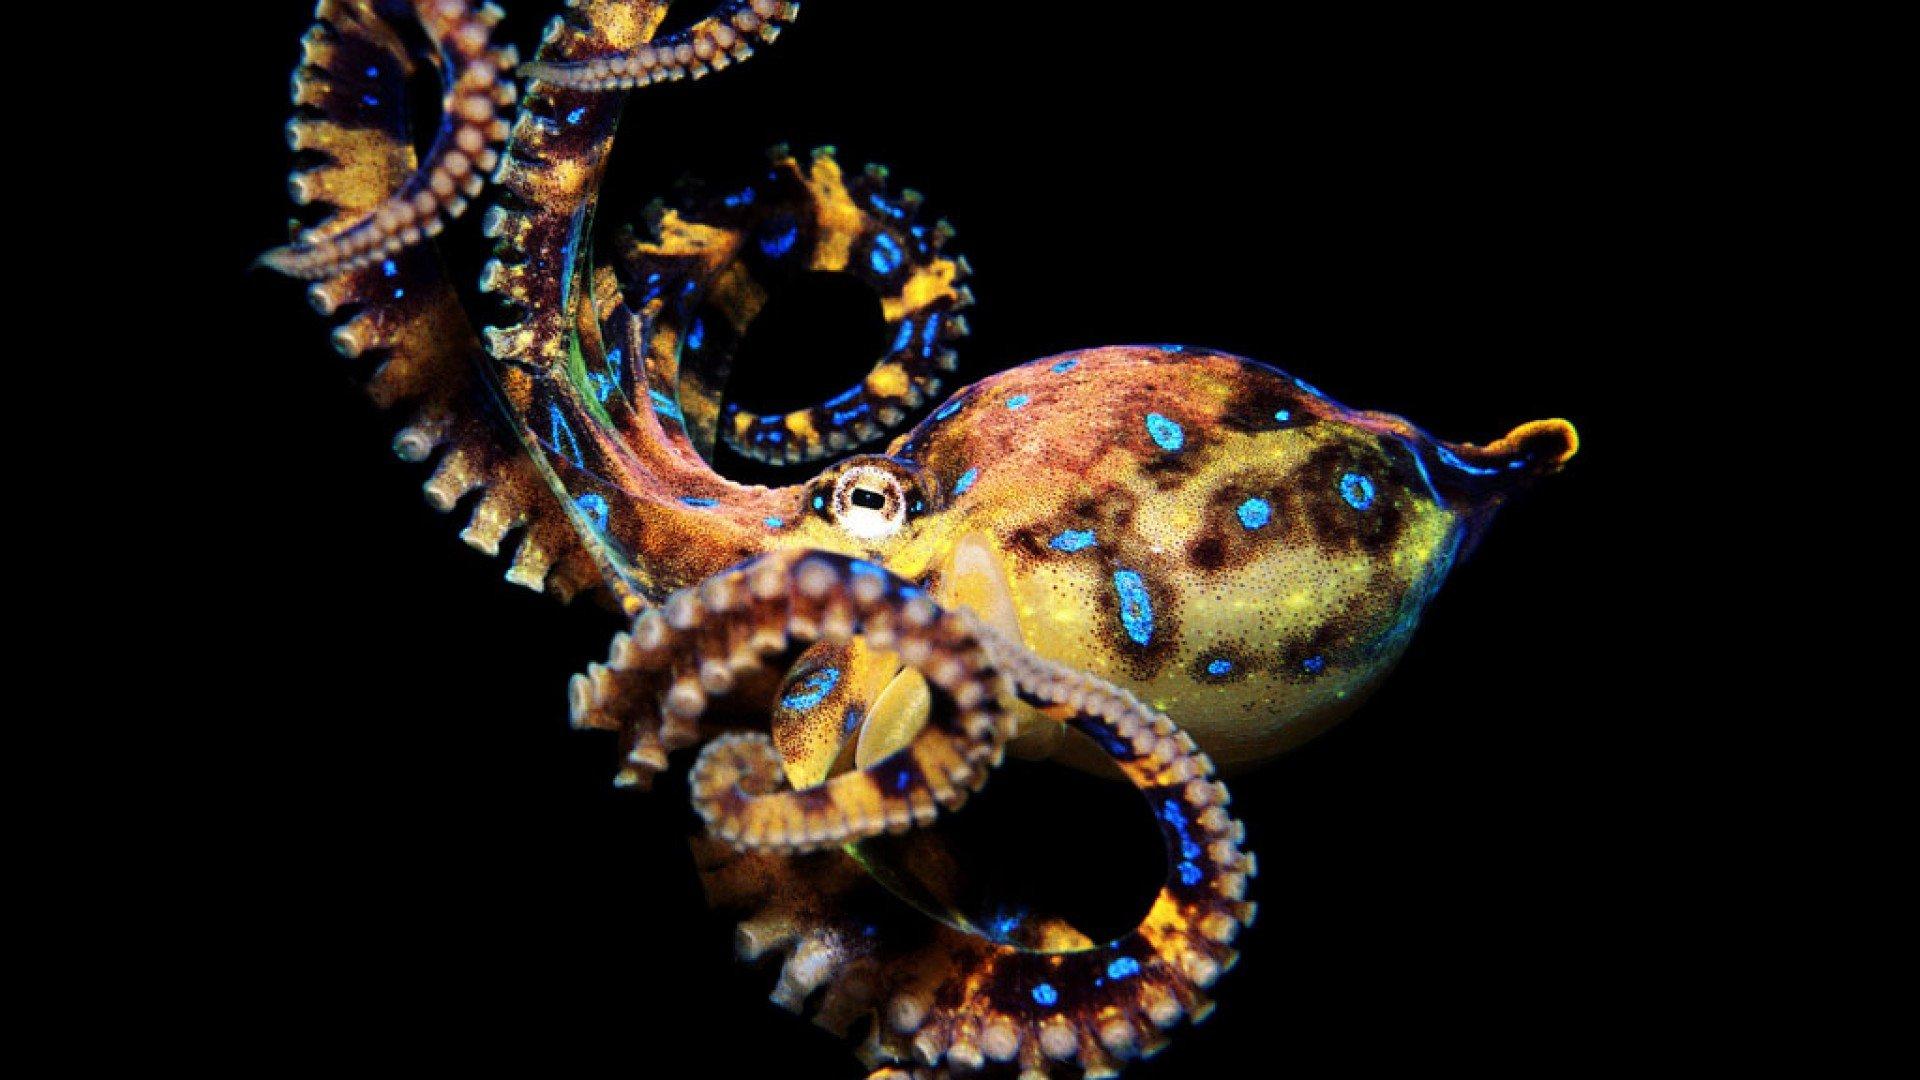 beautiful octopus wallpaper - photo #5